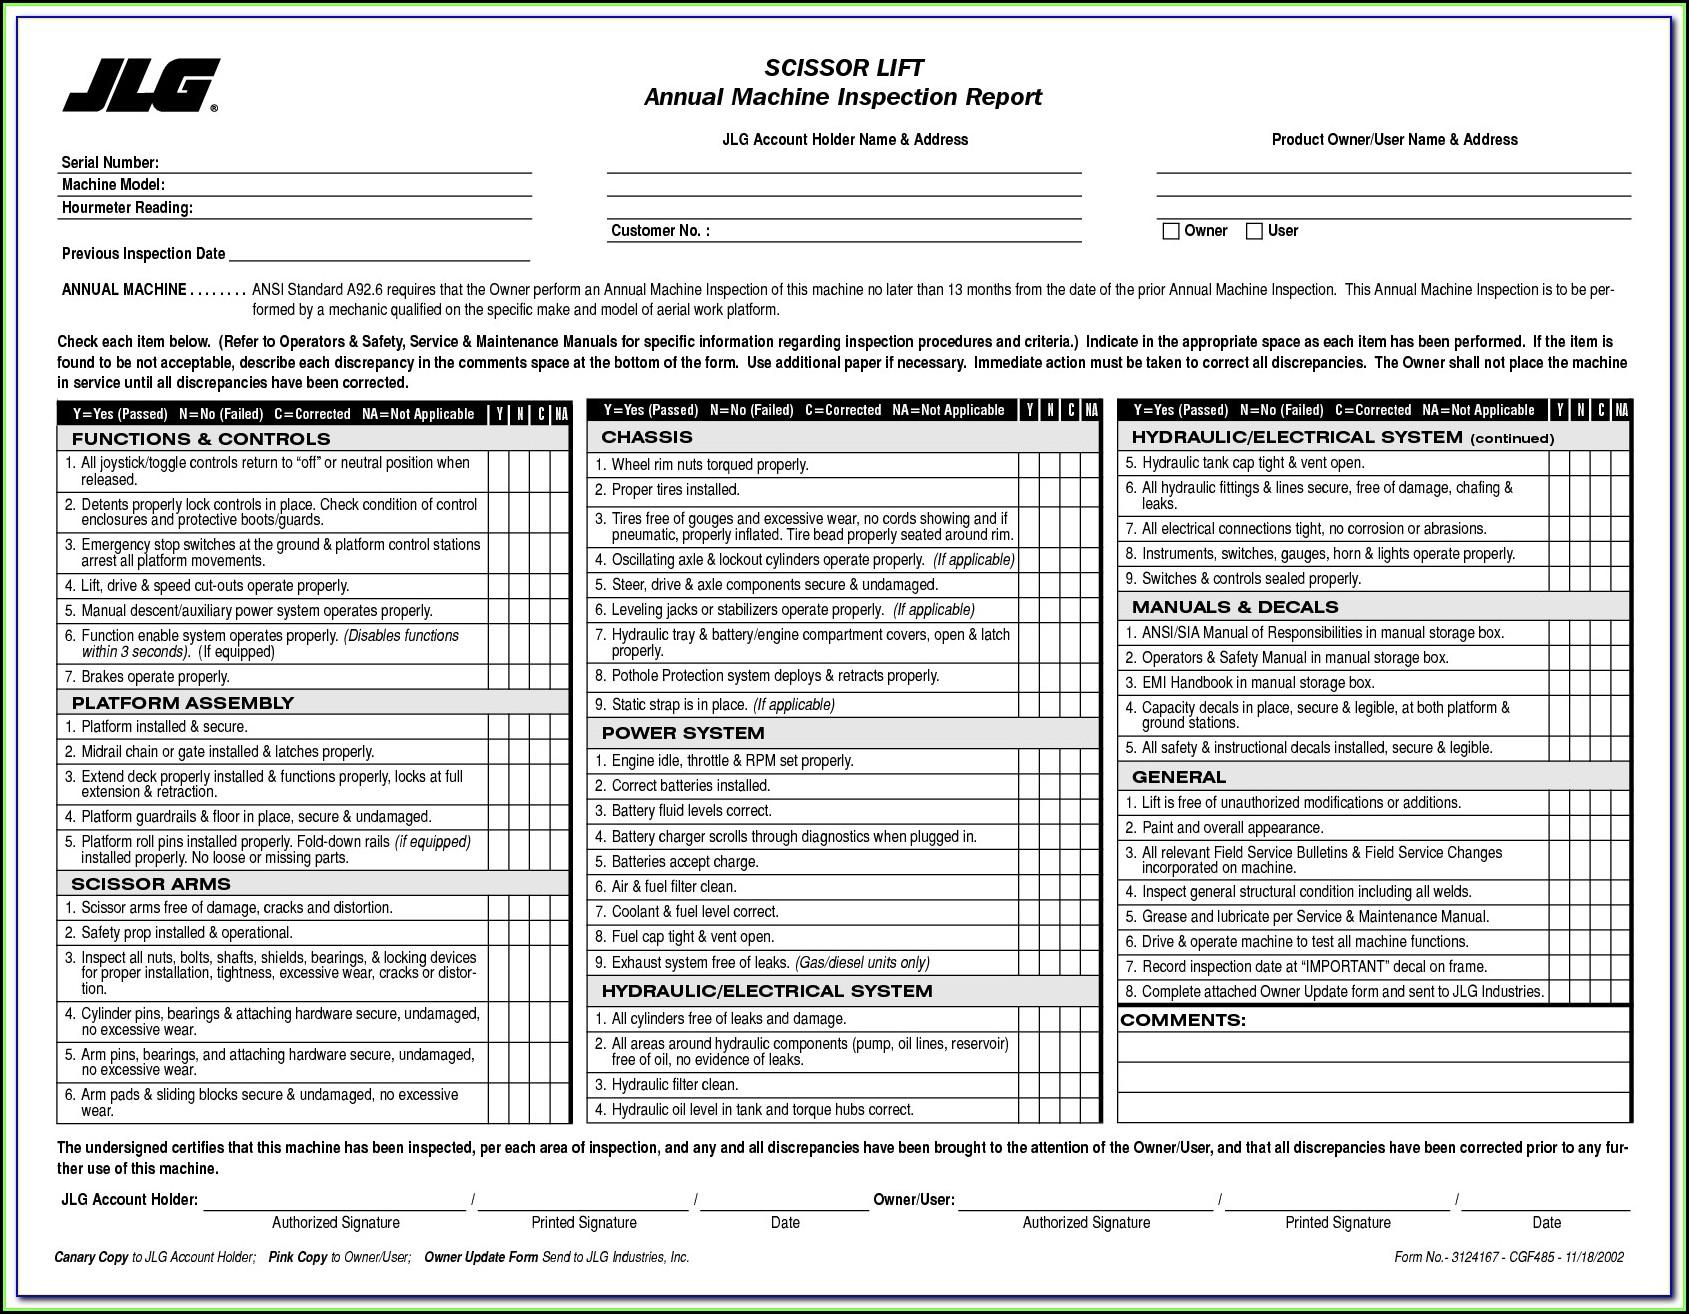 Jlg Scissor Lift Inspection Form